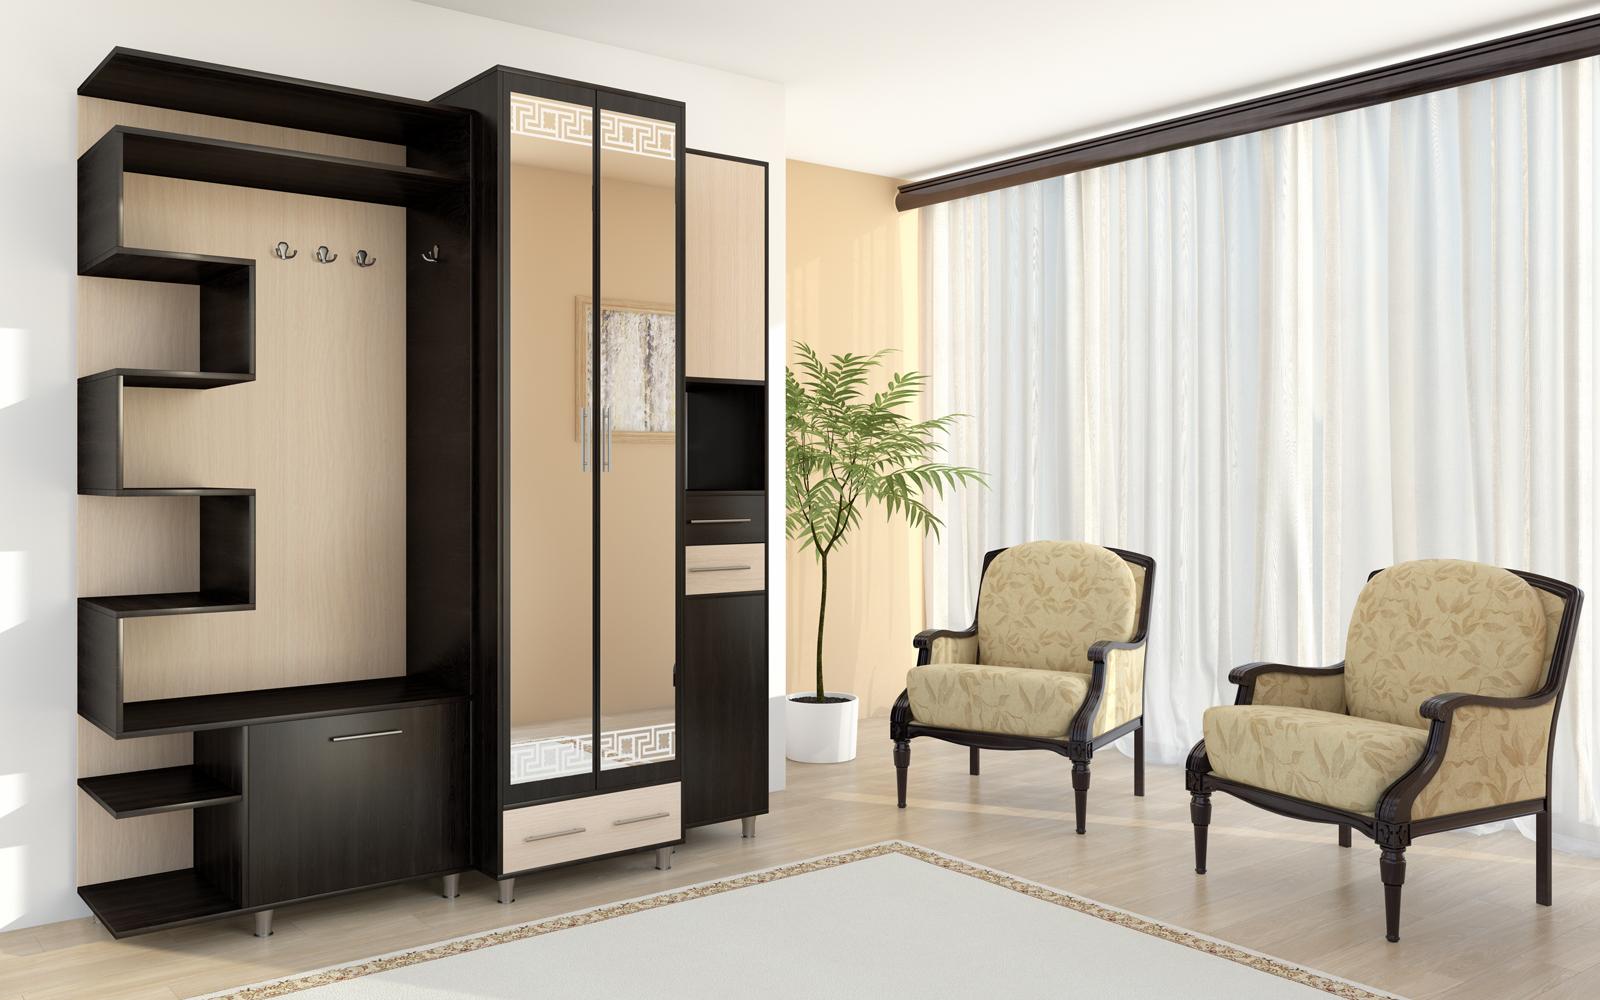 furniture_hallway_88